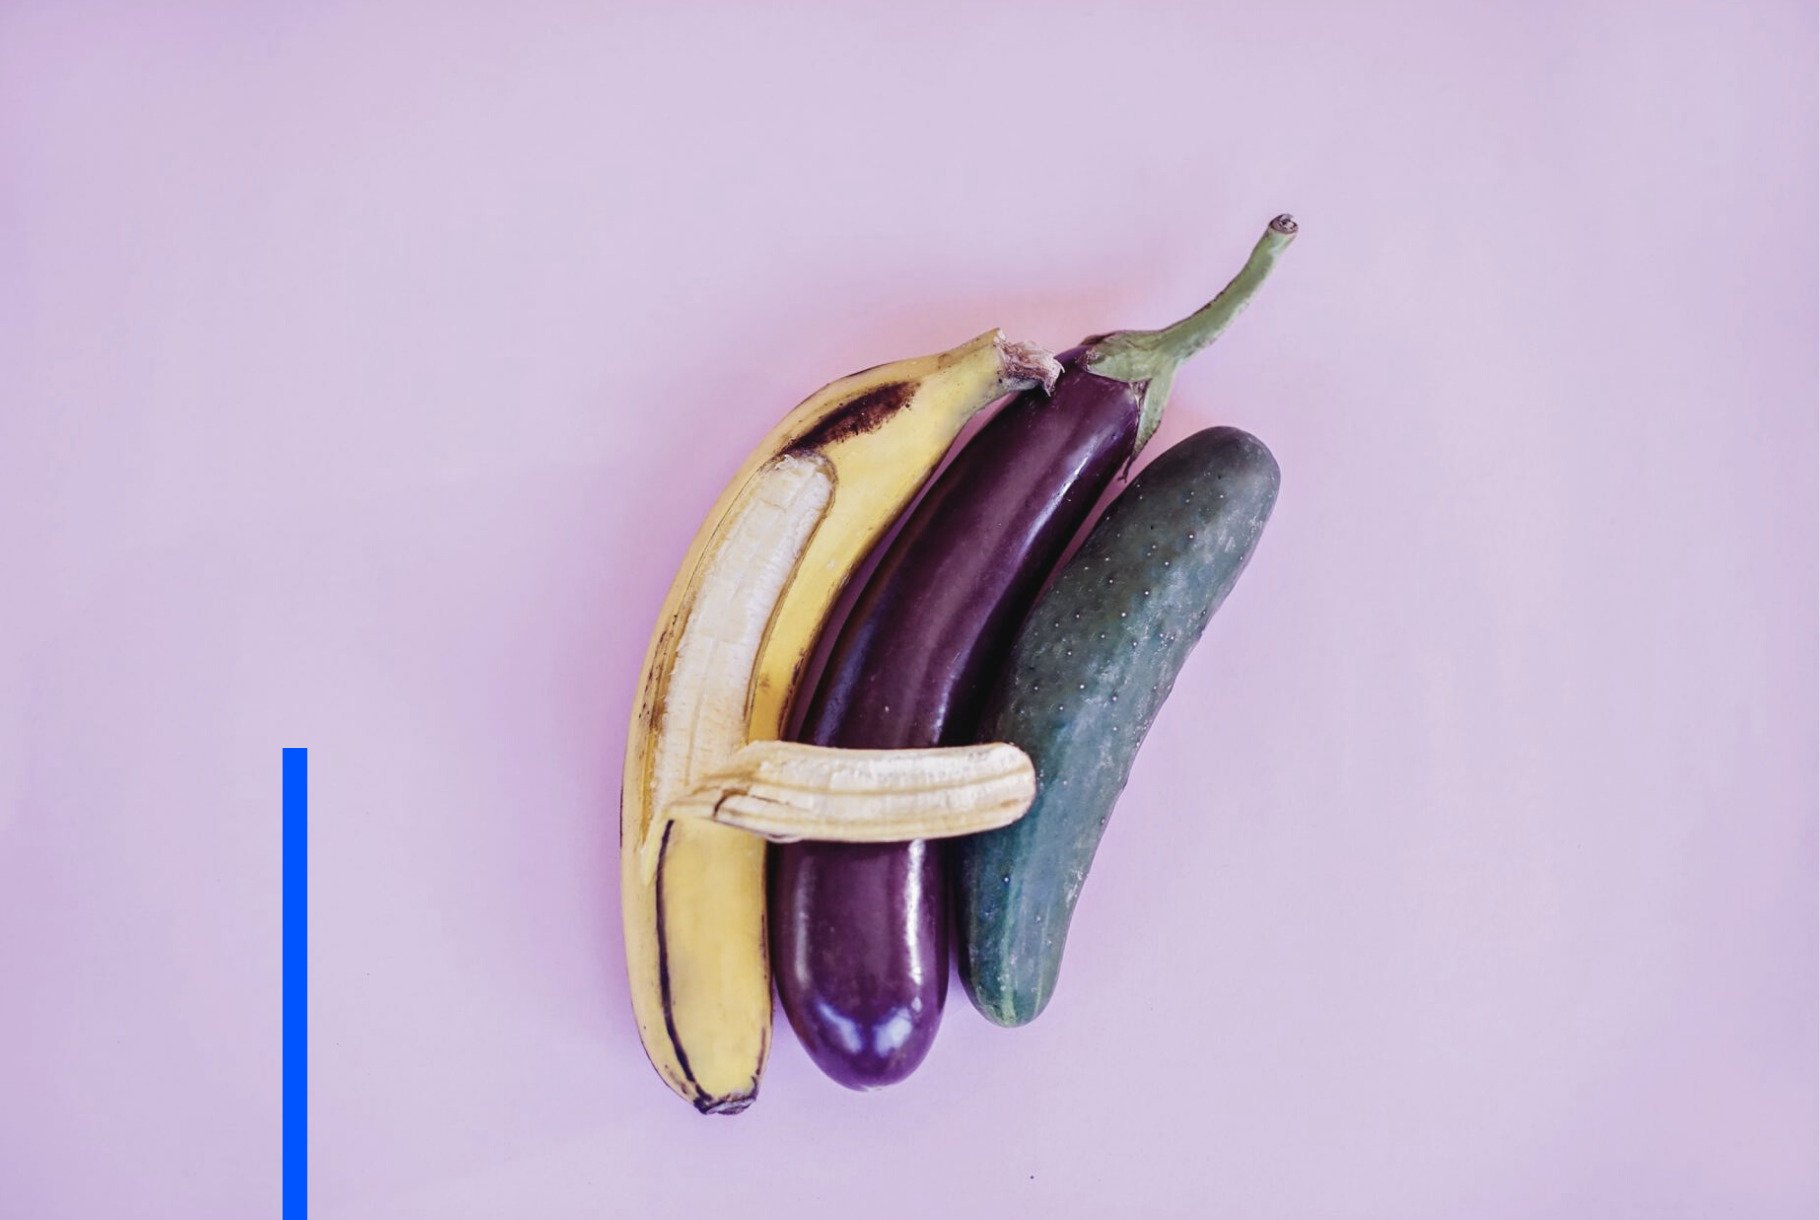 erekcijos ilgis